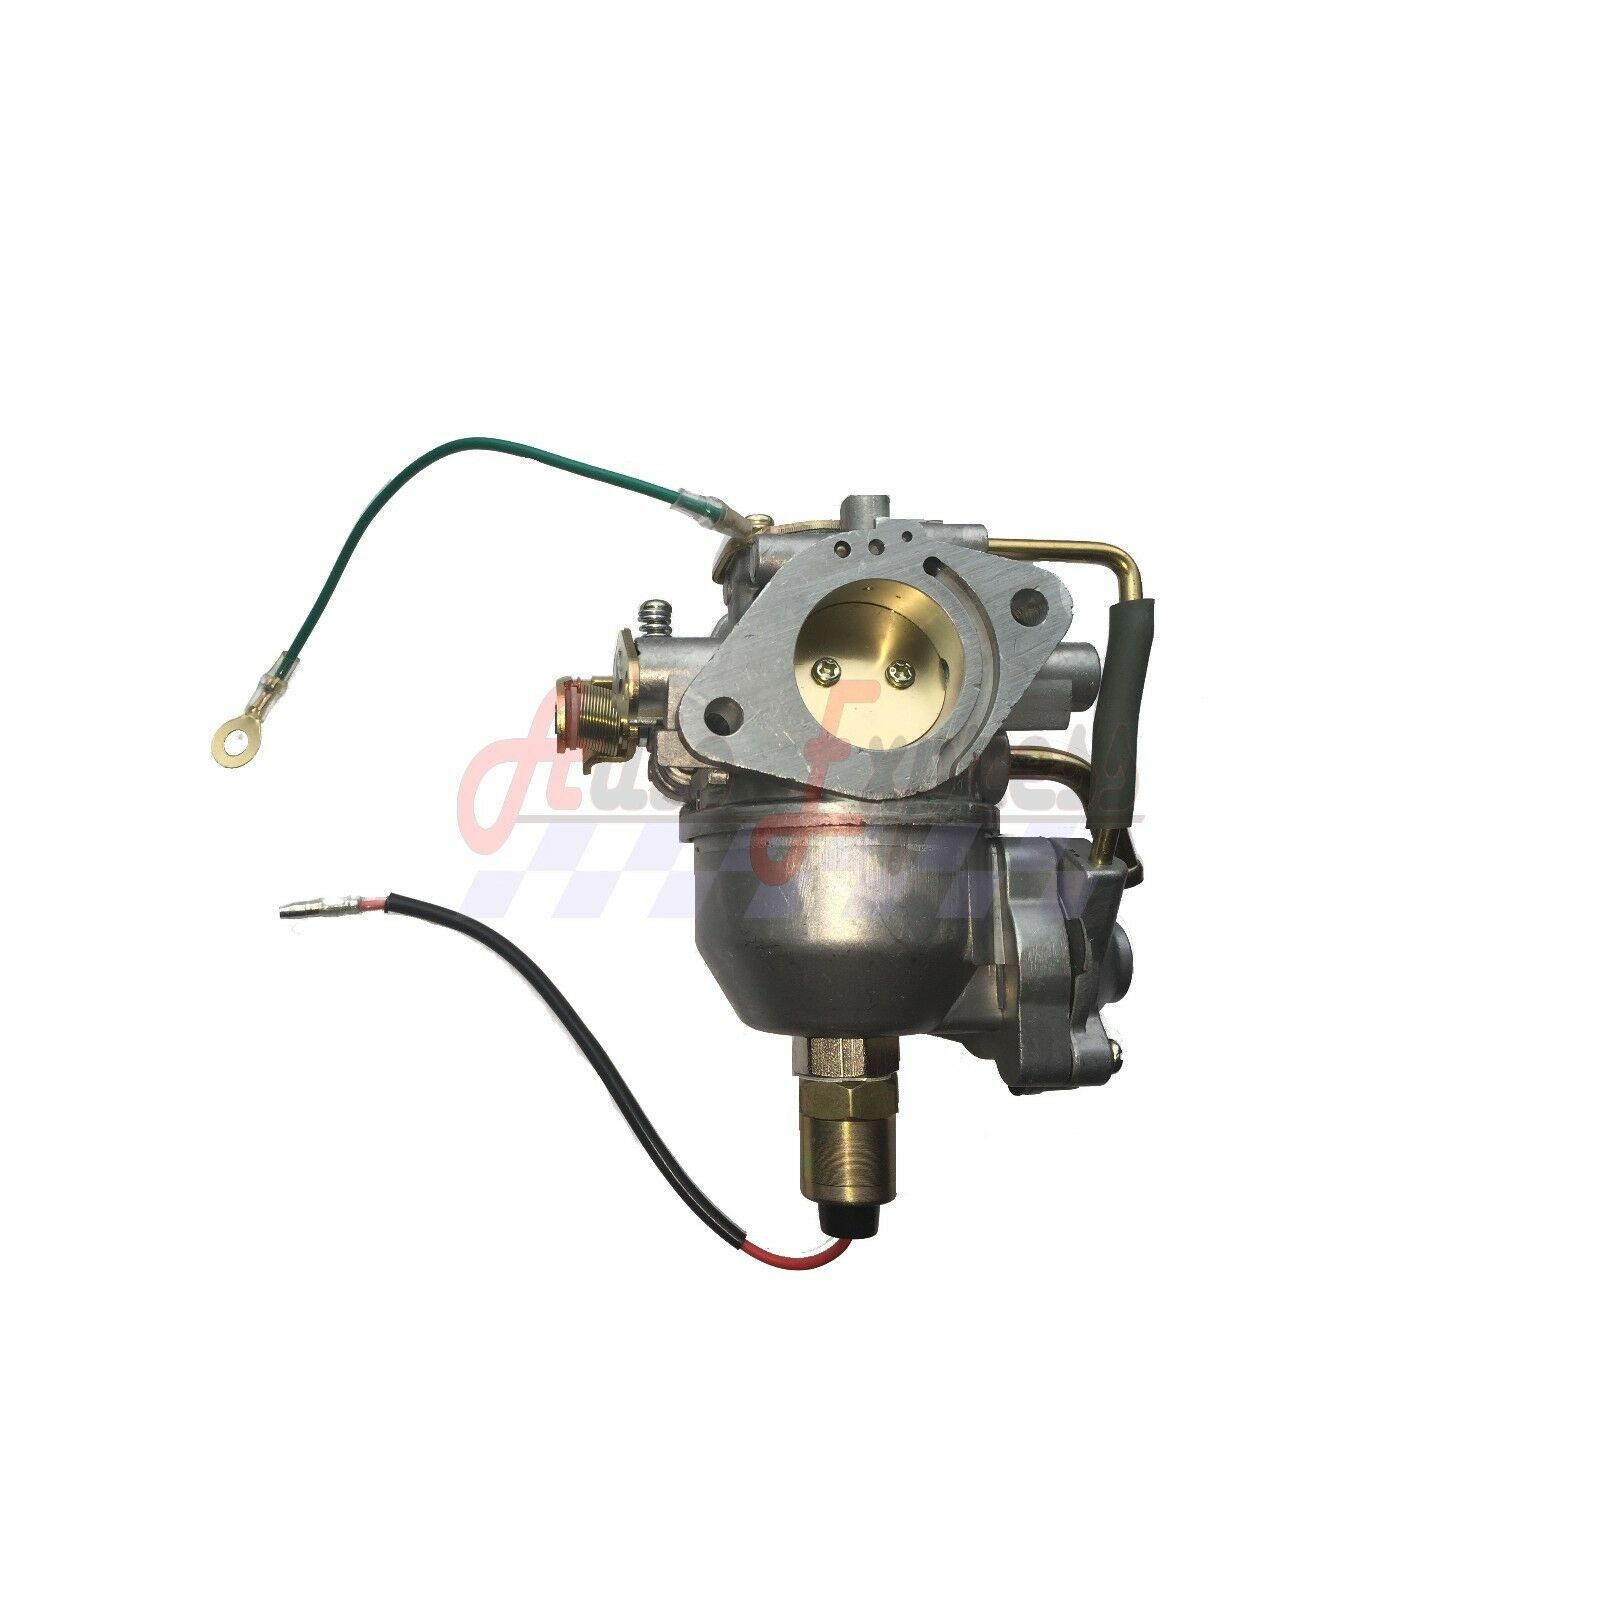 Cocheburador encaja Kohler Motor Craftsman Cub 25 27 Hp cv730 cv740 Nikki Cocheb